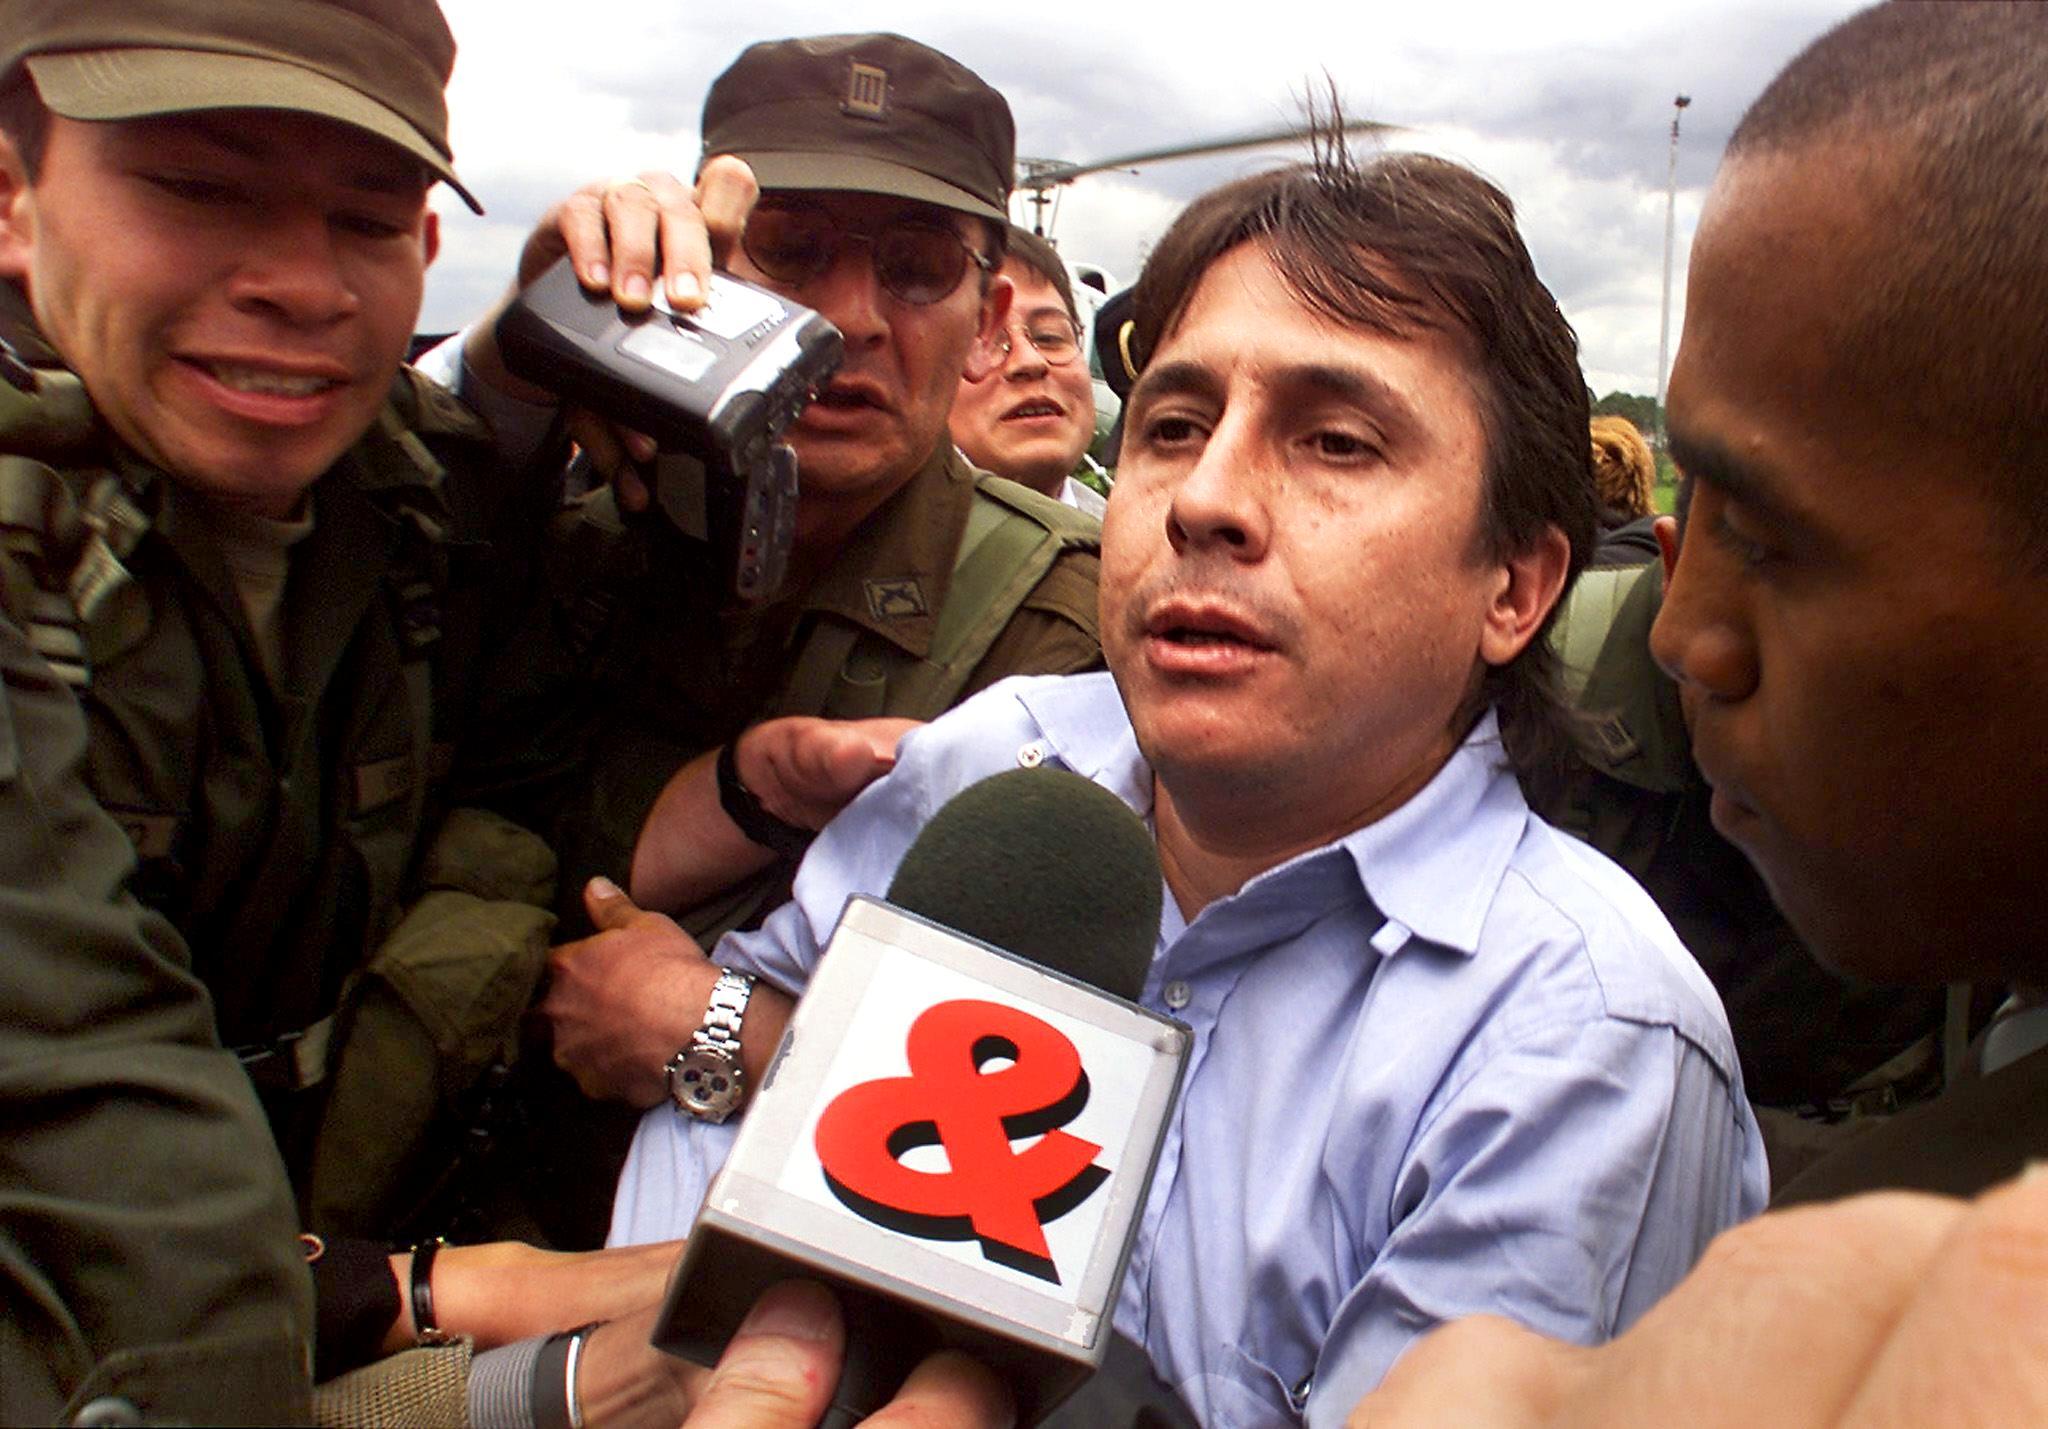 Prominent Colombian drug trafficker Fabio Ochoa Vasquez